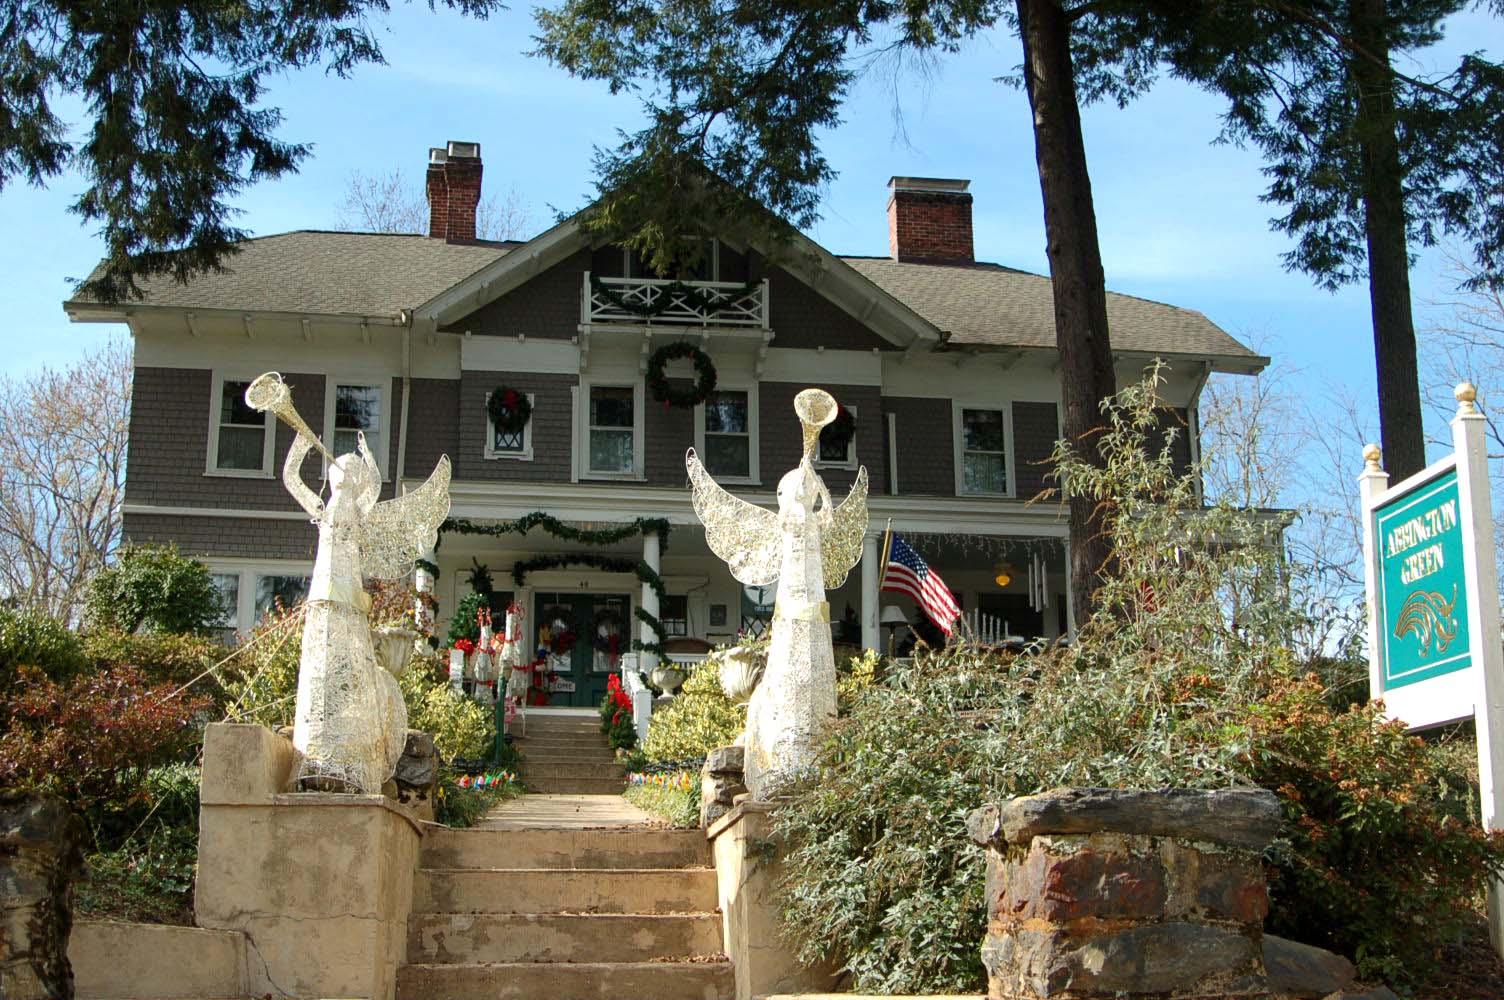 Montford Neighborhood Holiday Tour